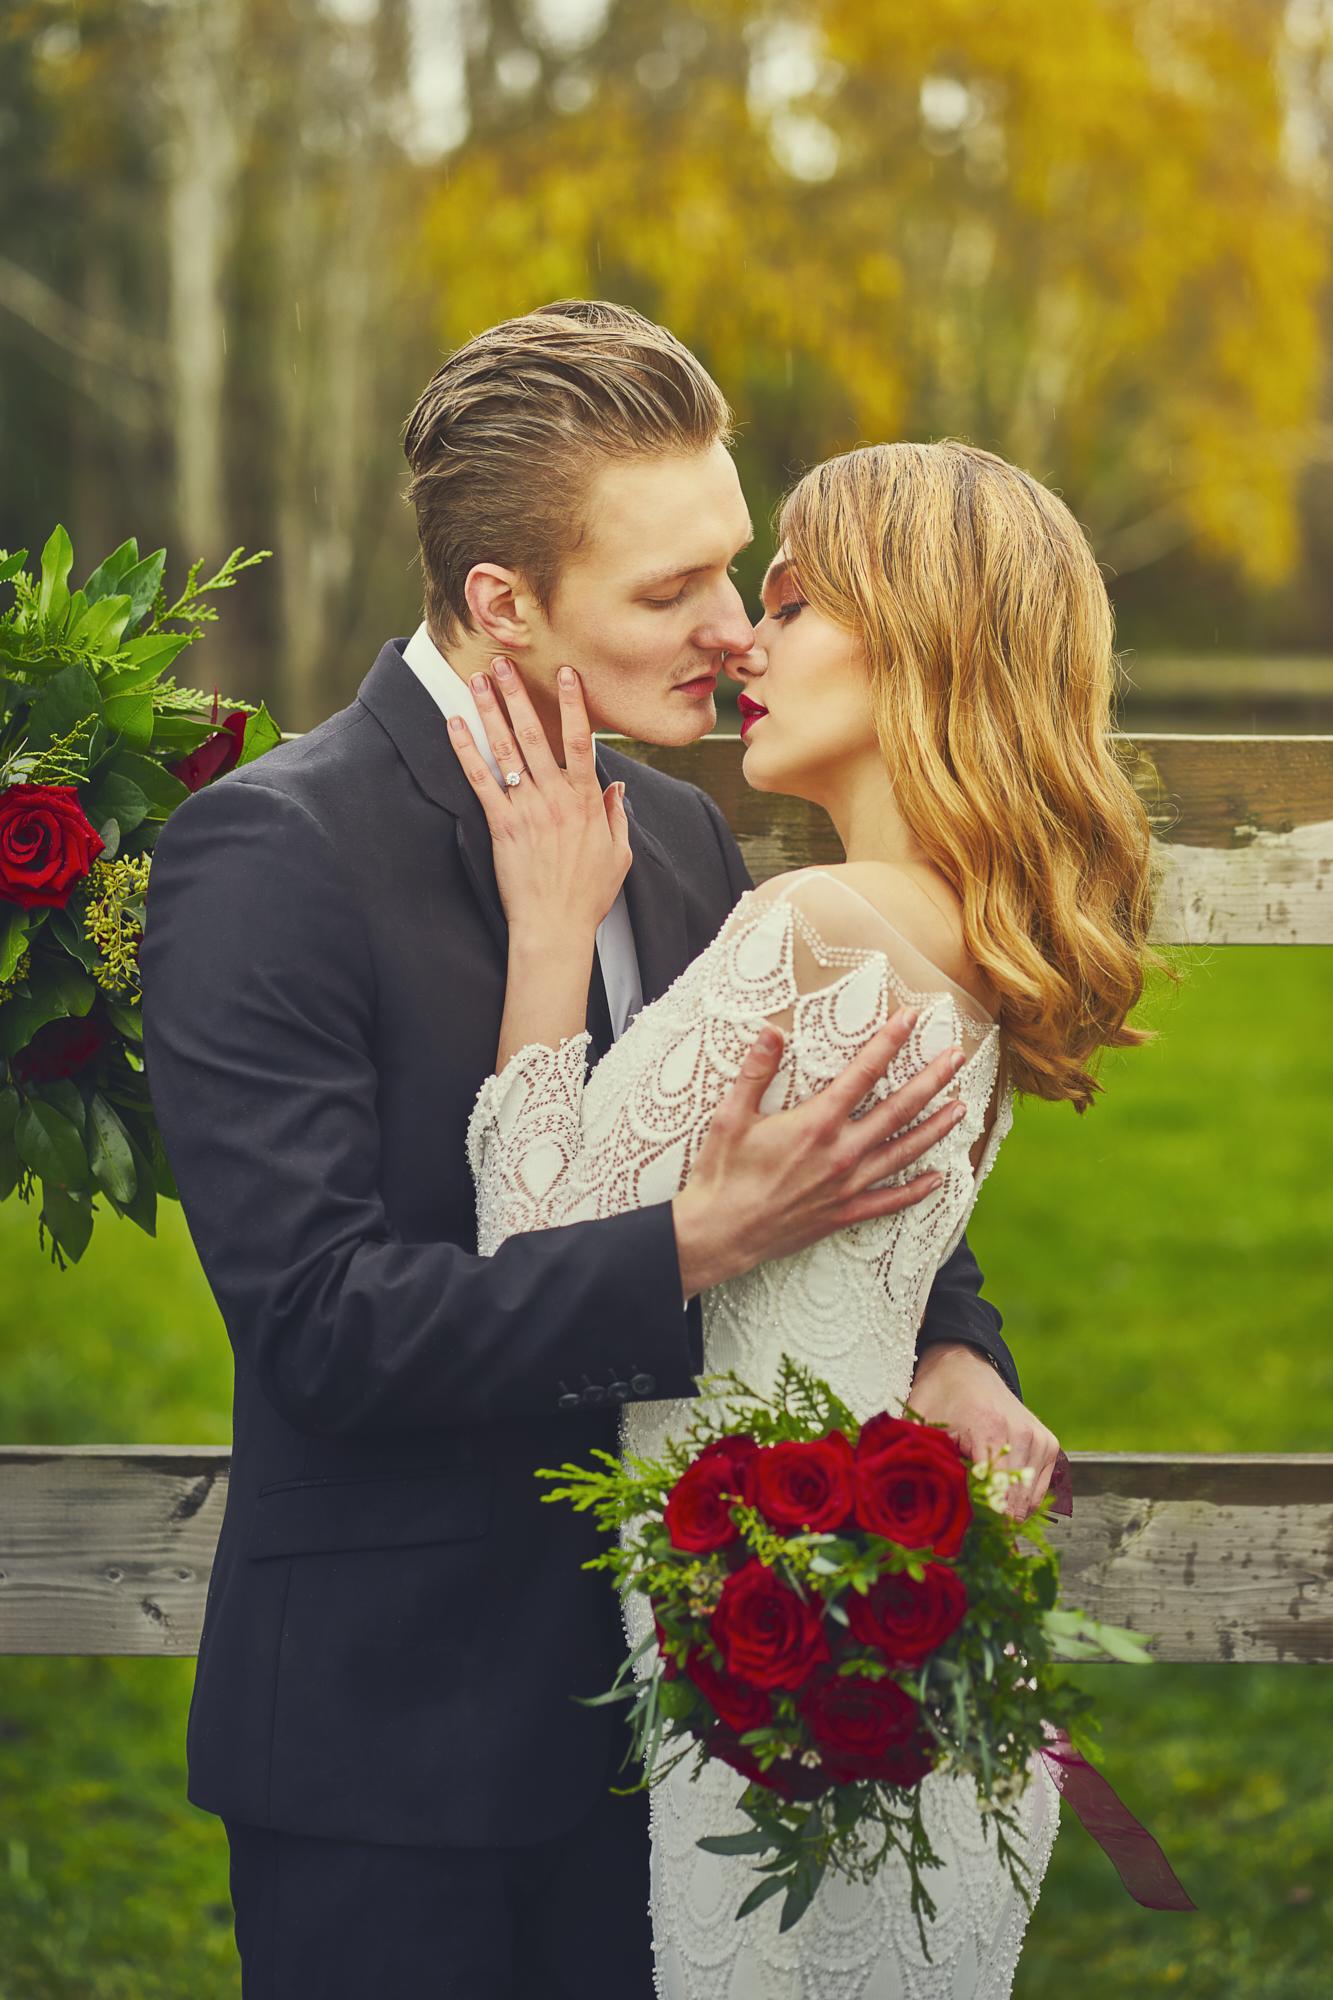 Nov 25 - Bridal Farm Style Shoot - FinalEdit - Web 0024.jpg